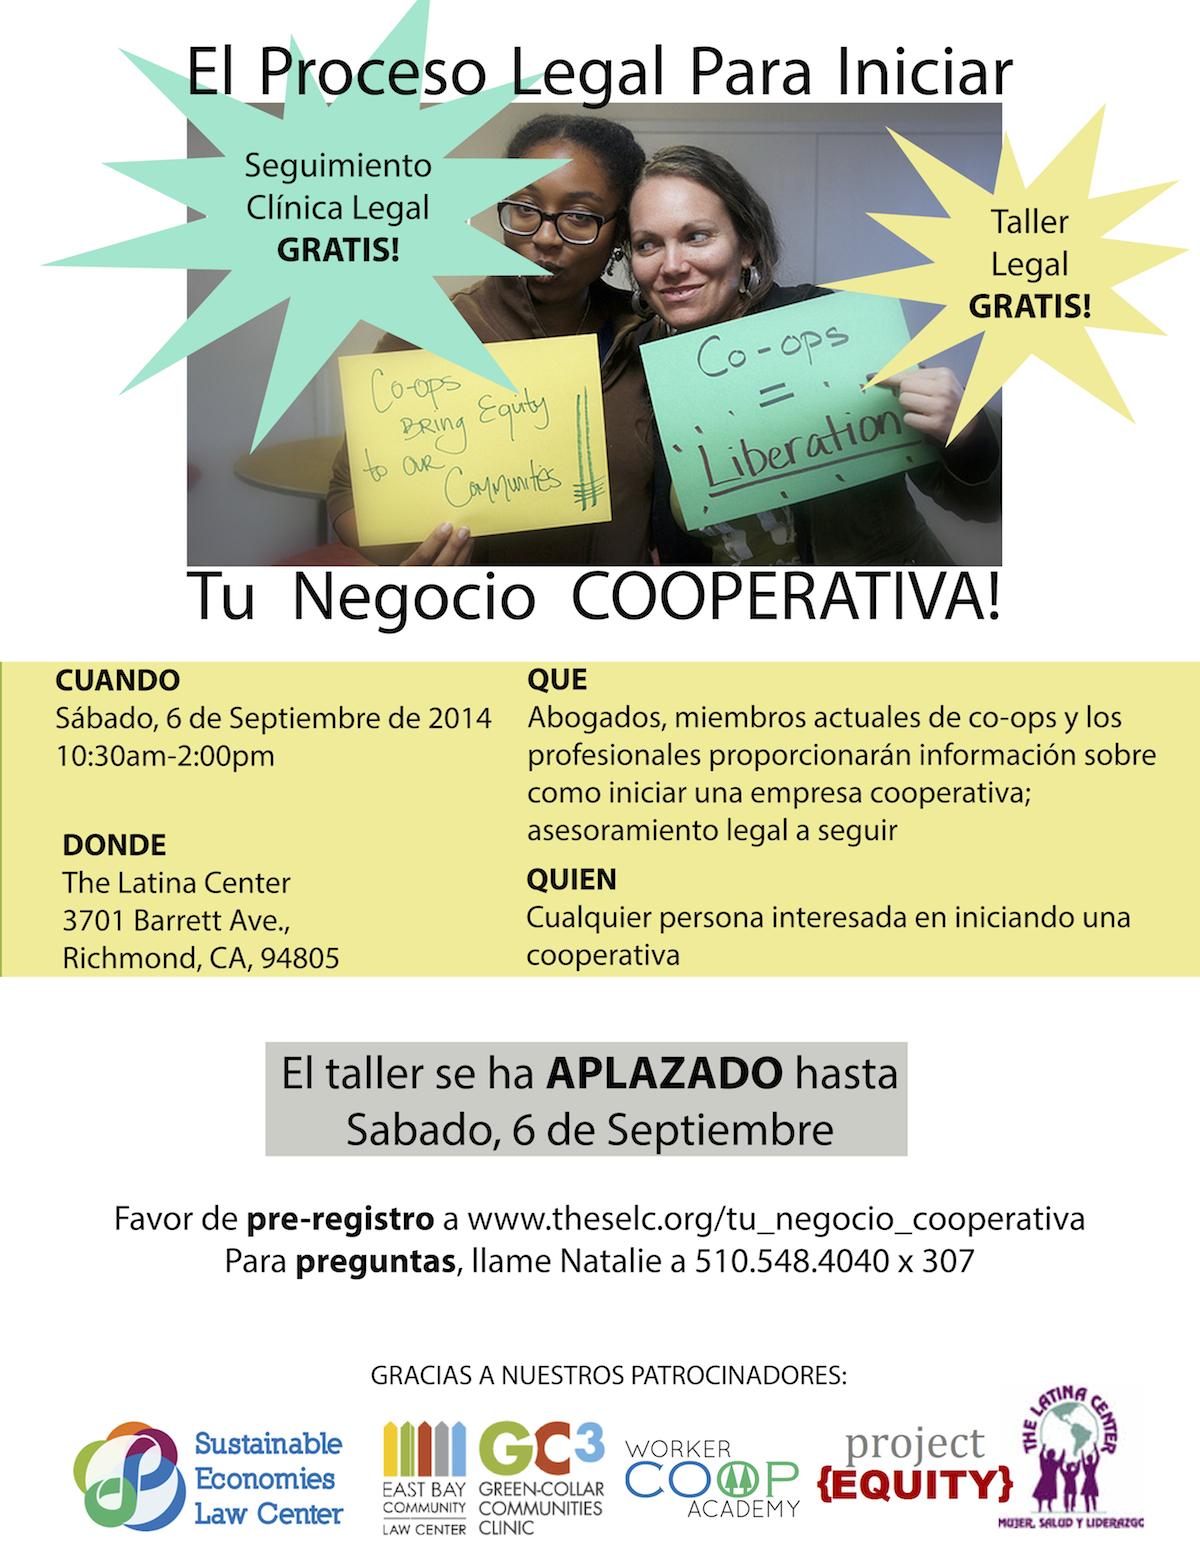 http://www.theselc.org/tu_negocio_cooperativa